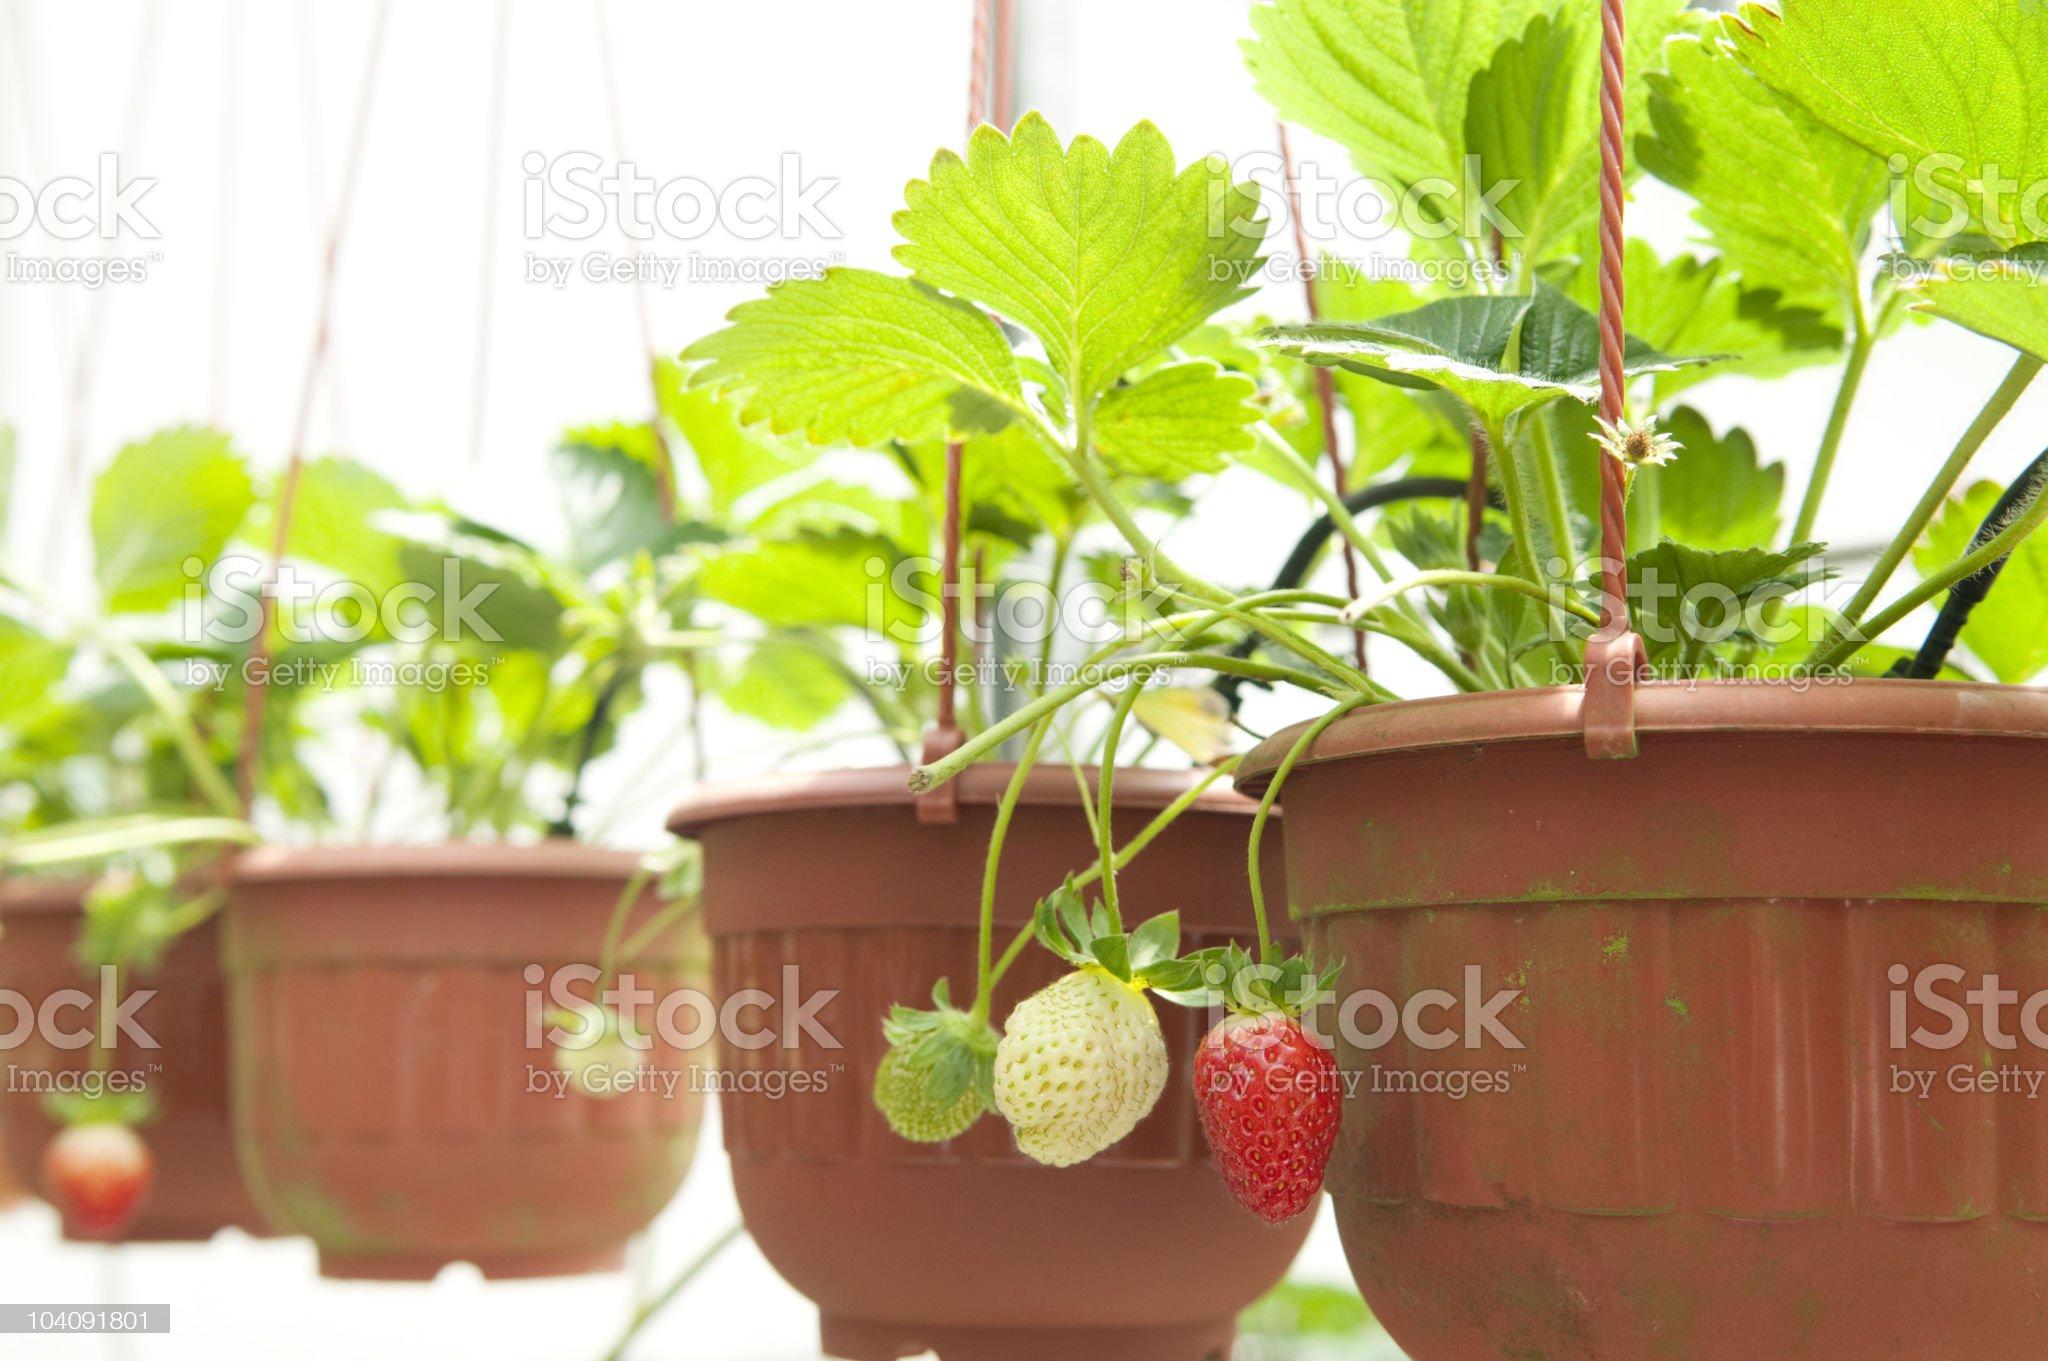 Strawberry plant royalty-free stock photo